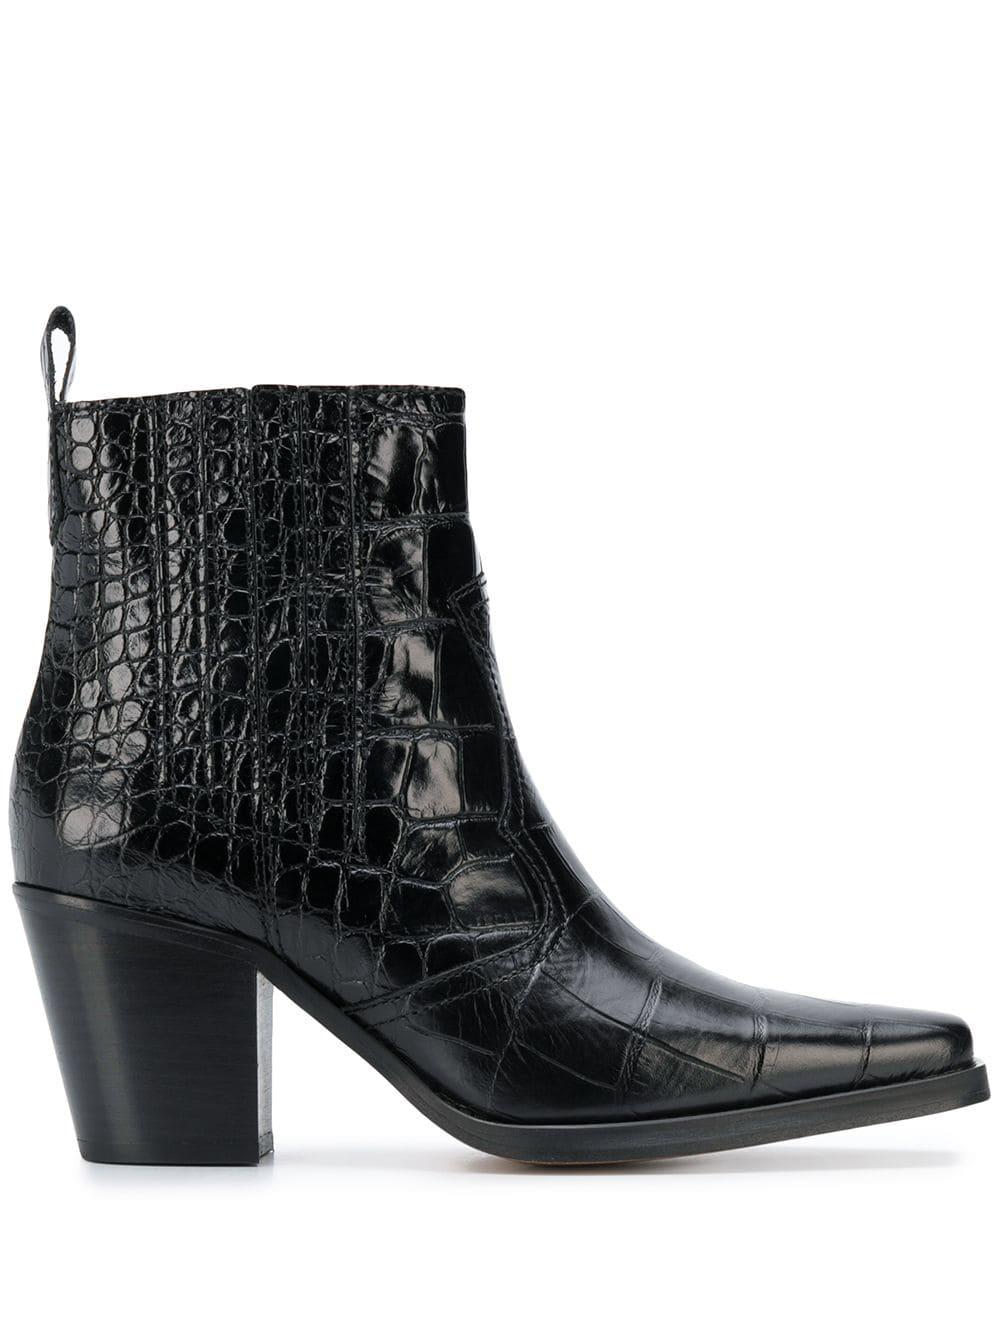 GANNI croc effect ankle boots.jpg